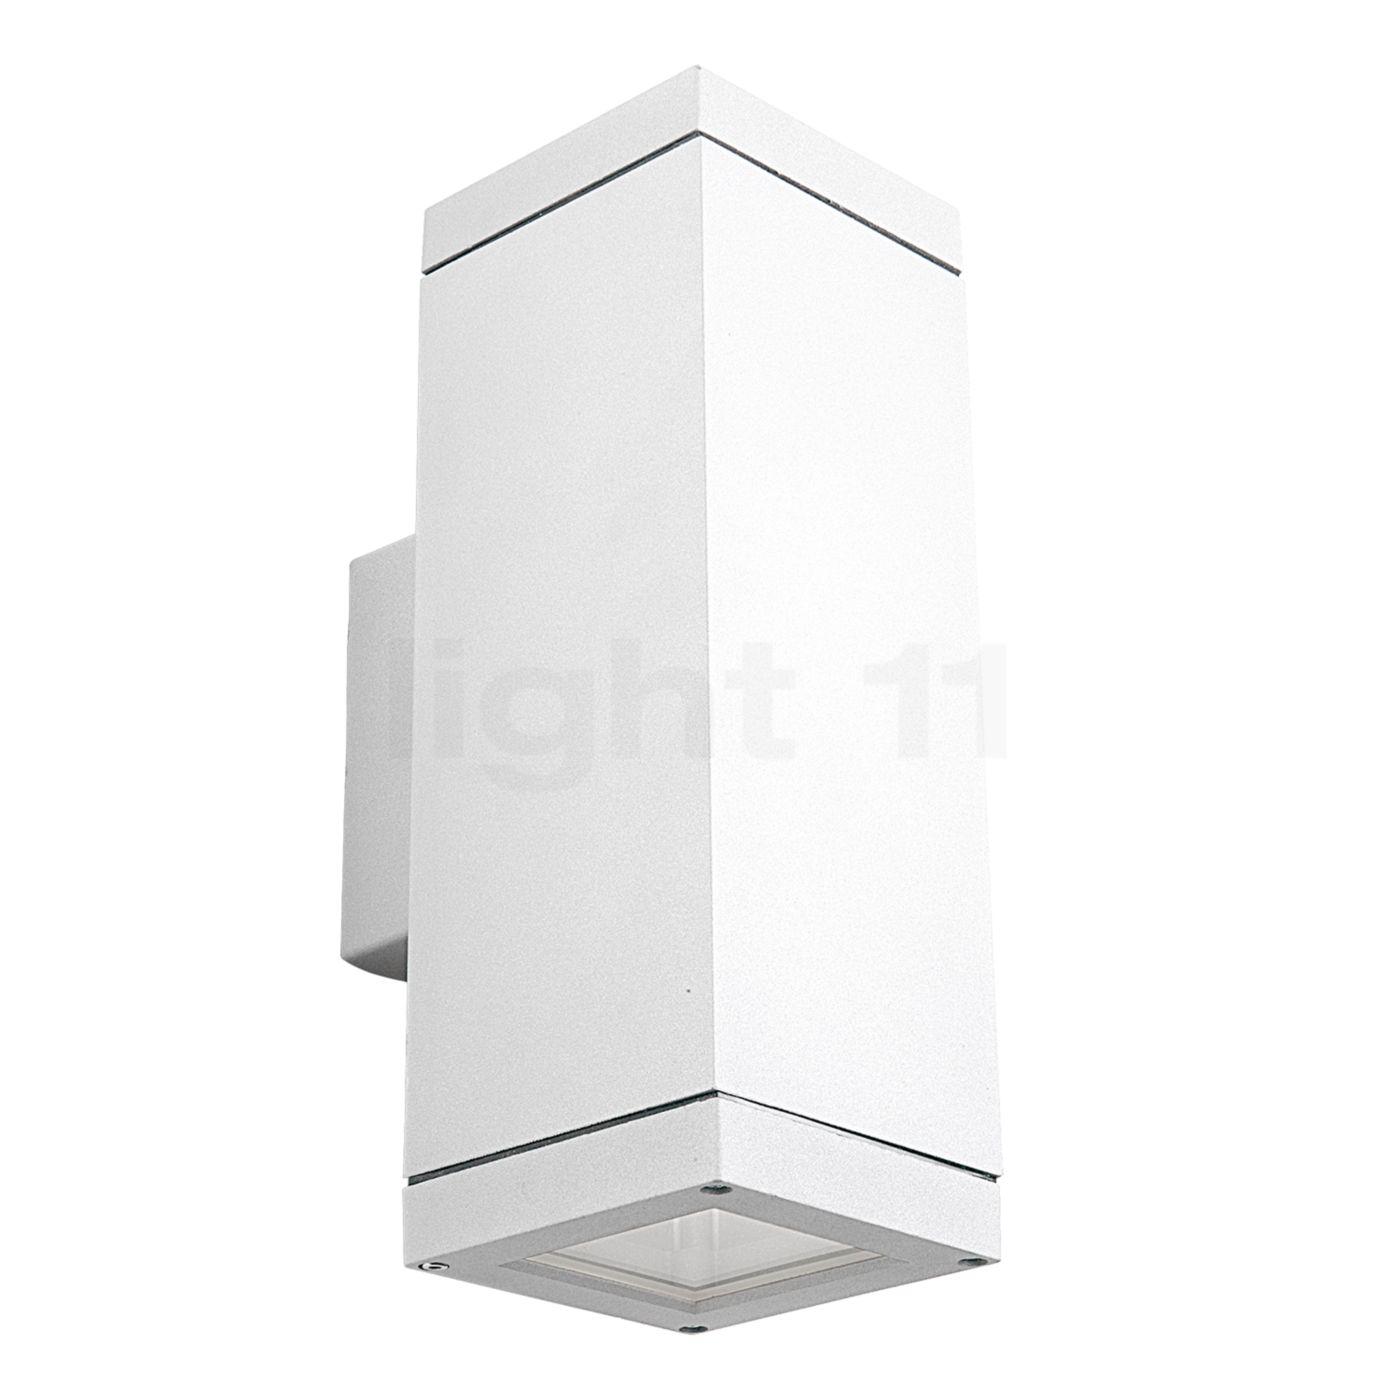 up down wall light cylindrical buy ledsc4 afrodita par30 updown wall light at